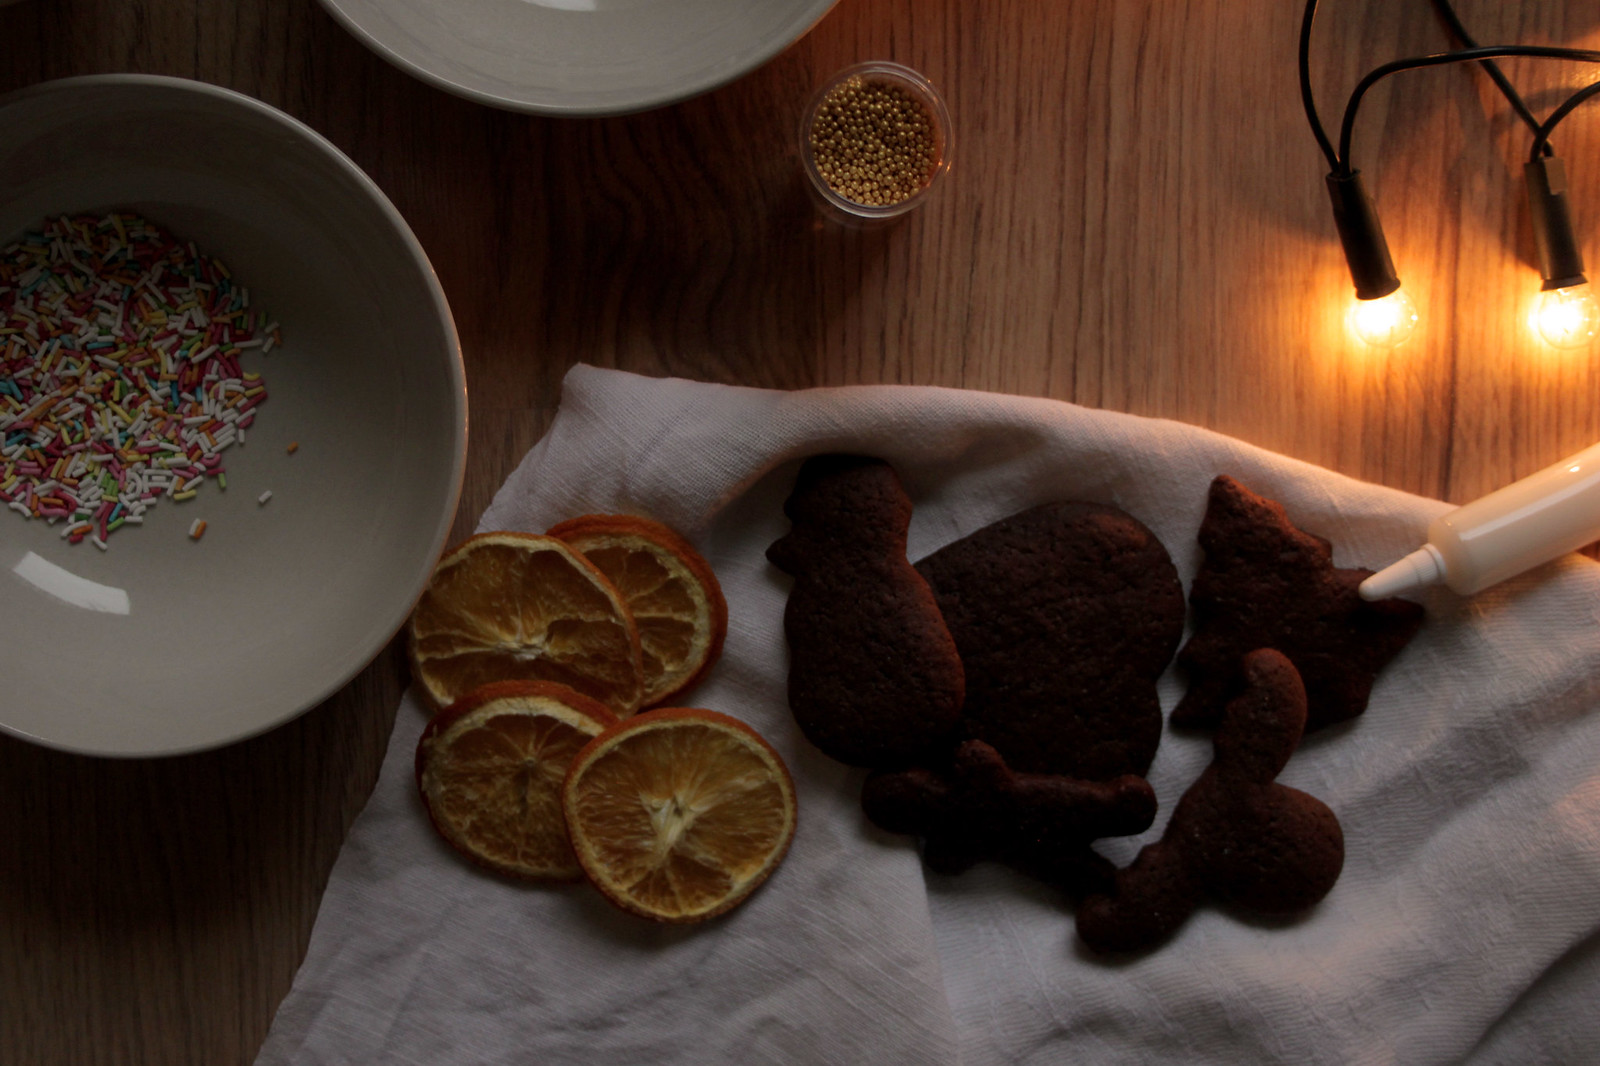 Gingerbread 11